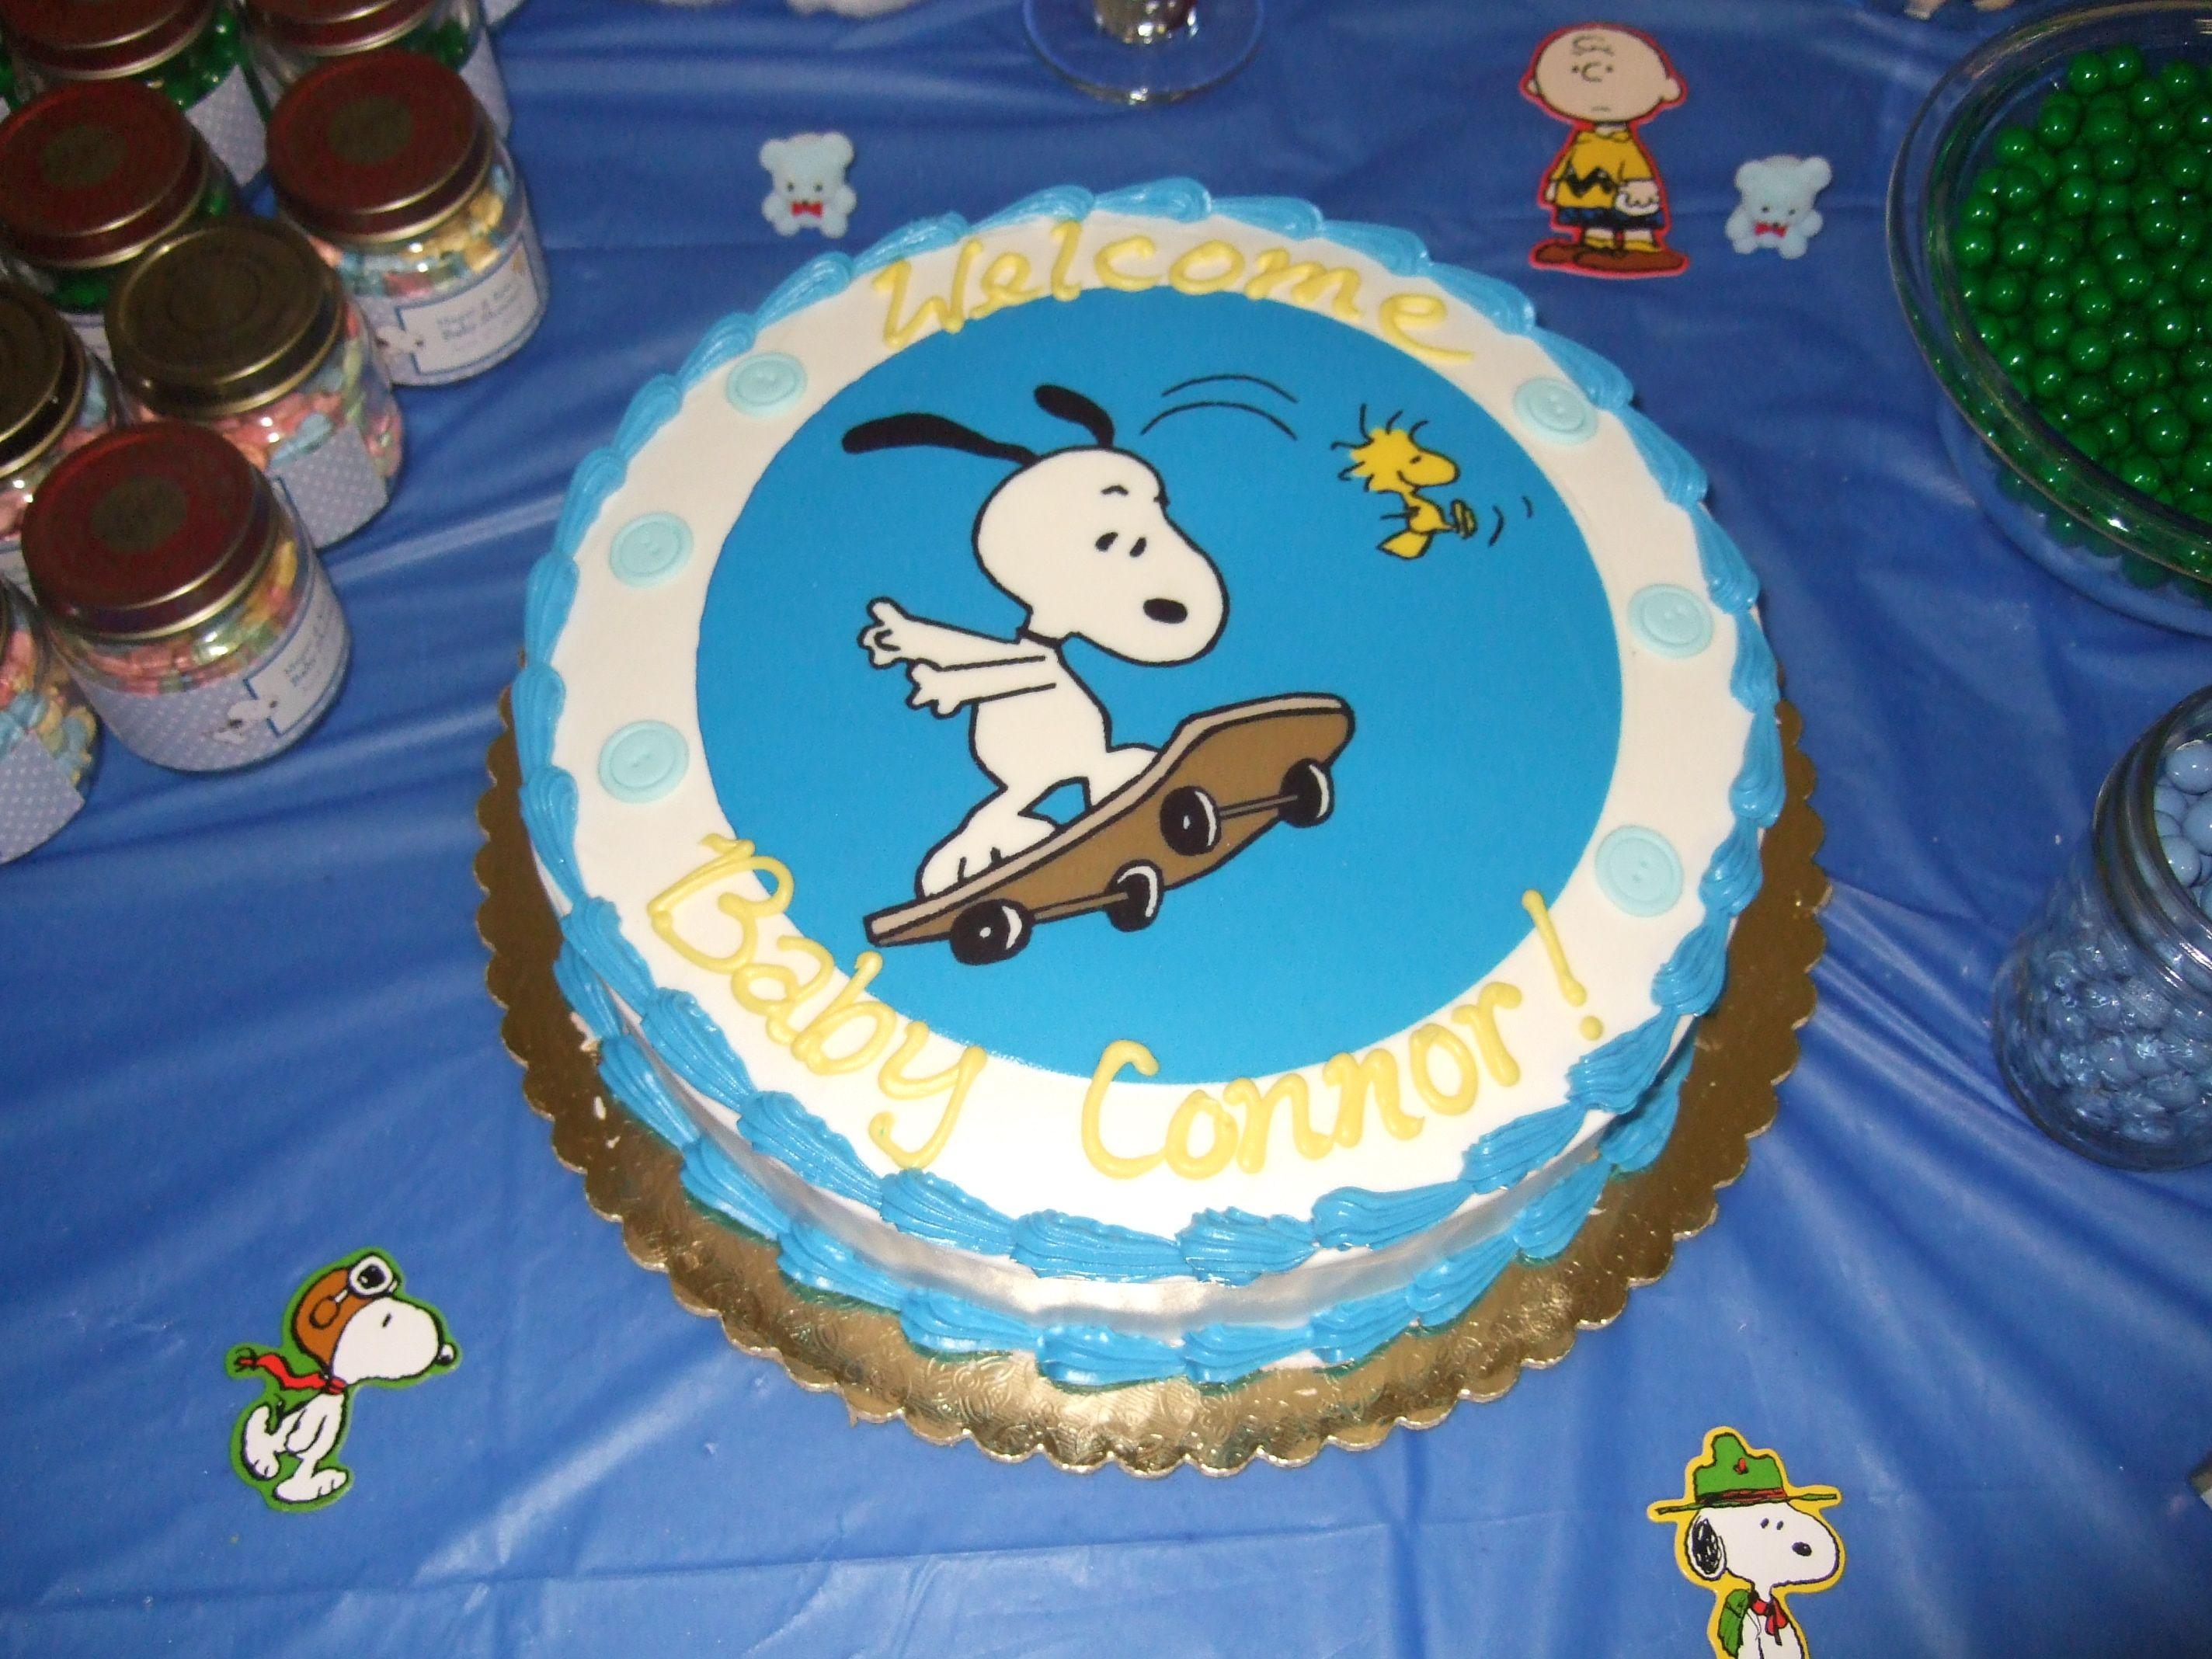 Skateboarding Snoopy Shower Cake